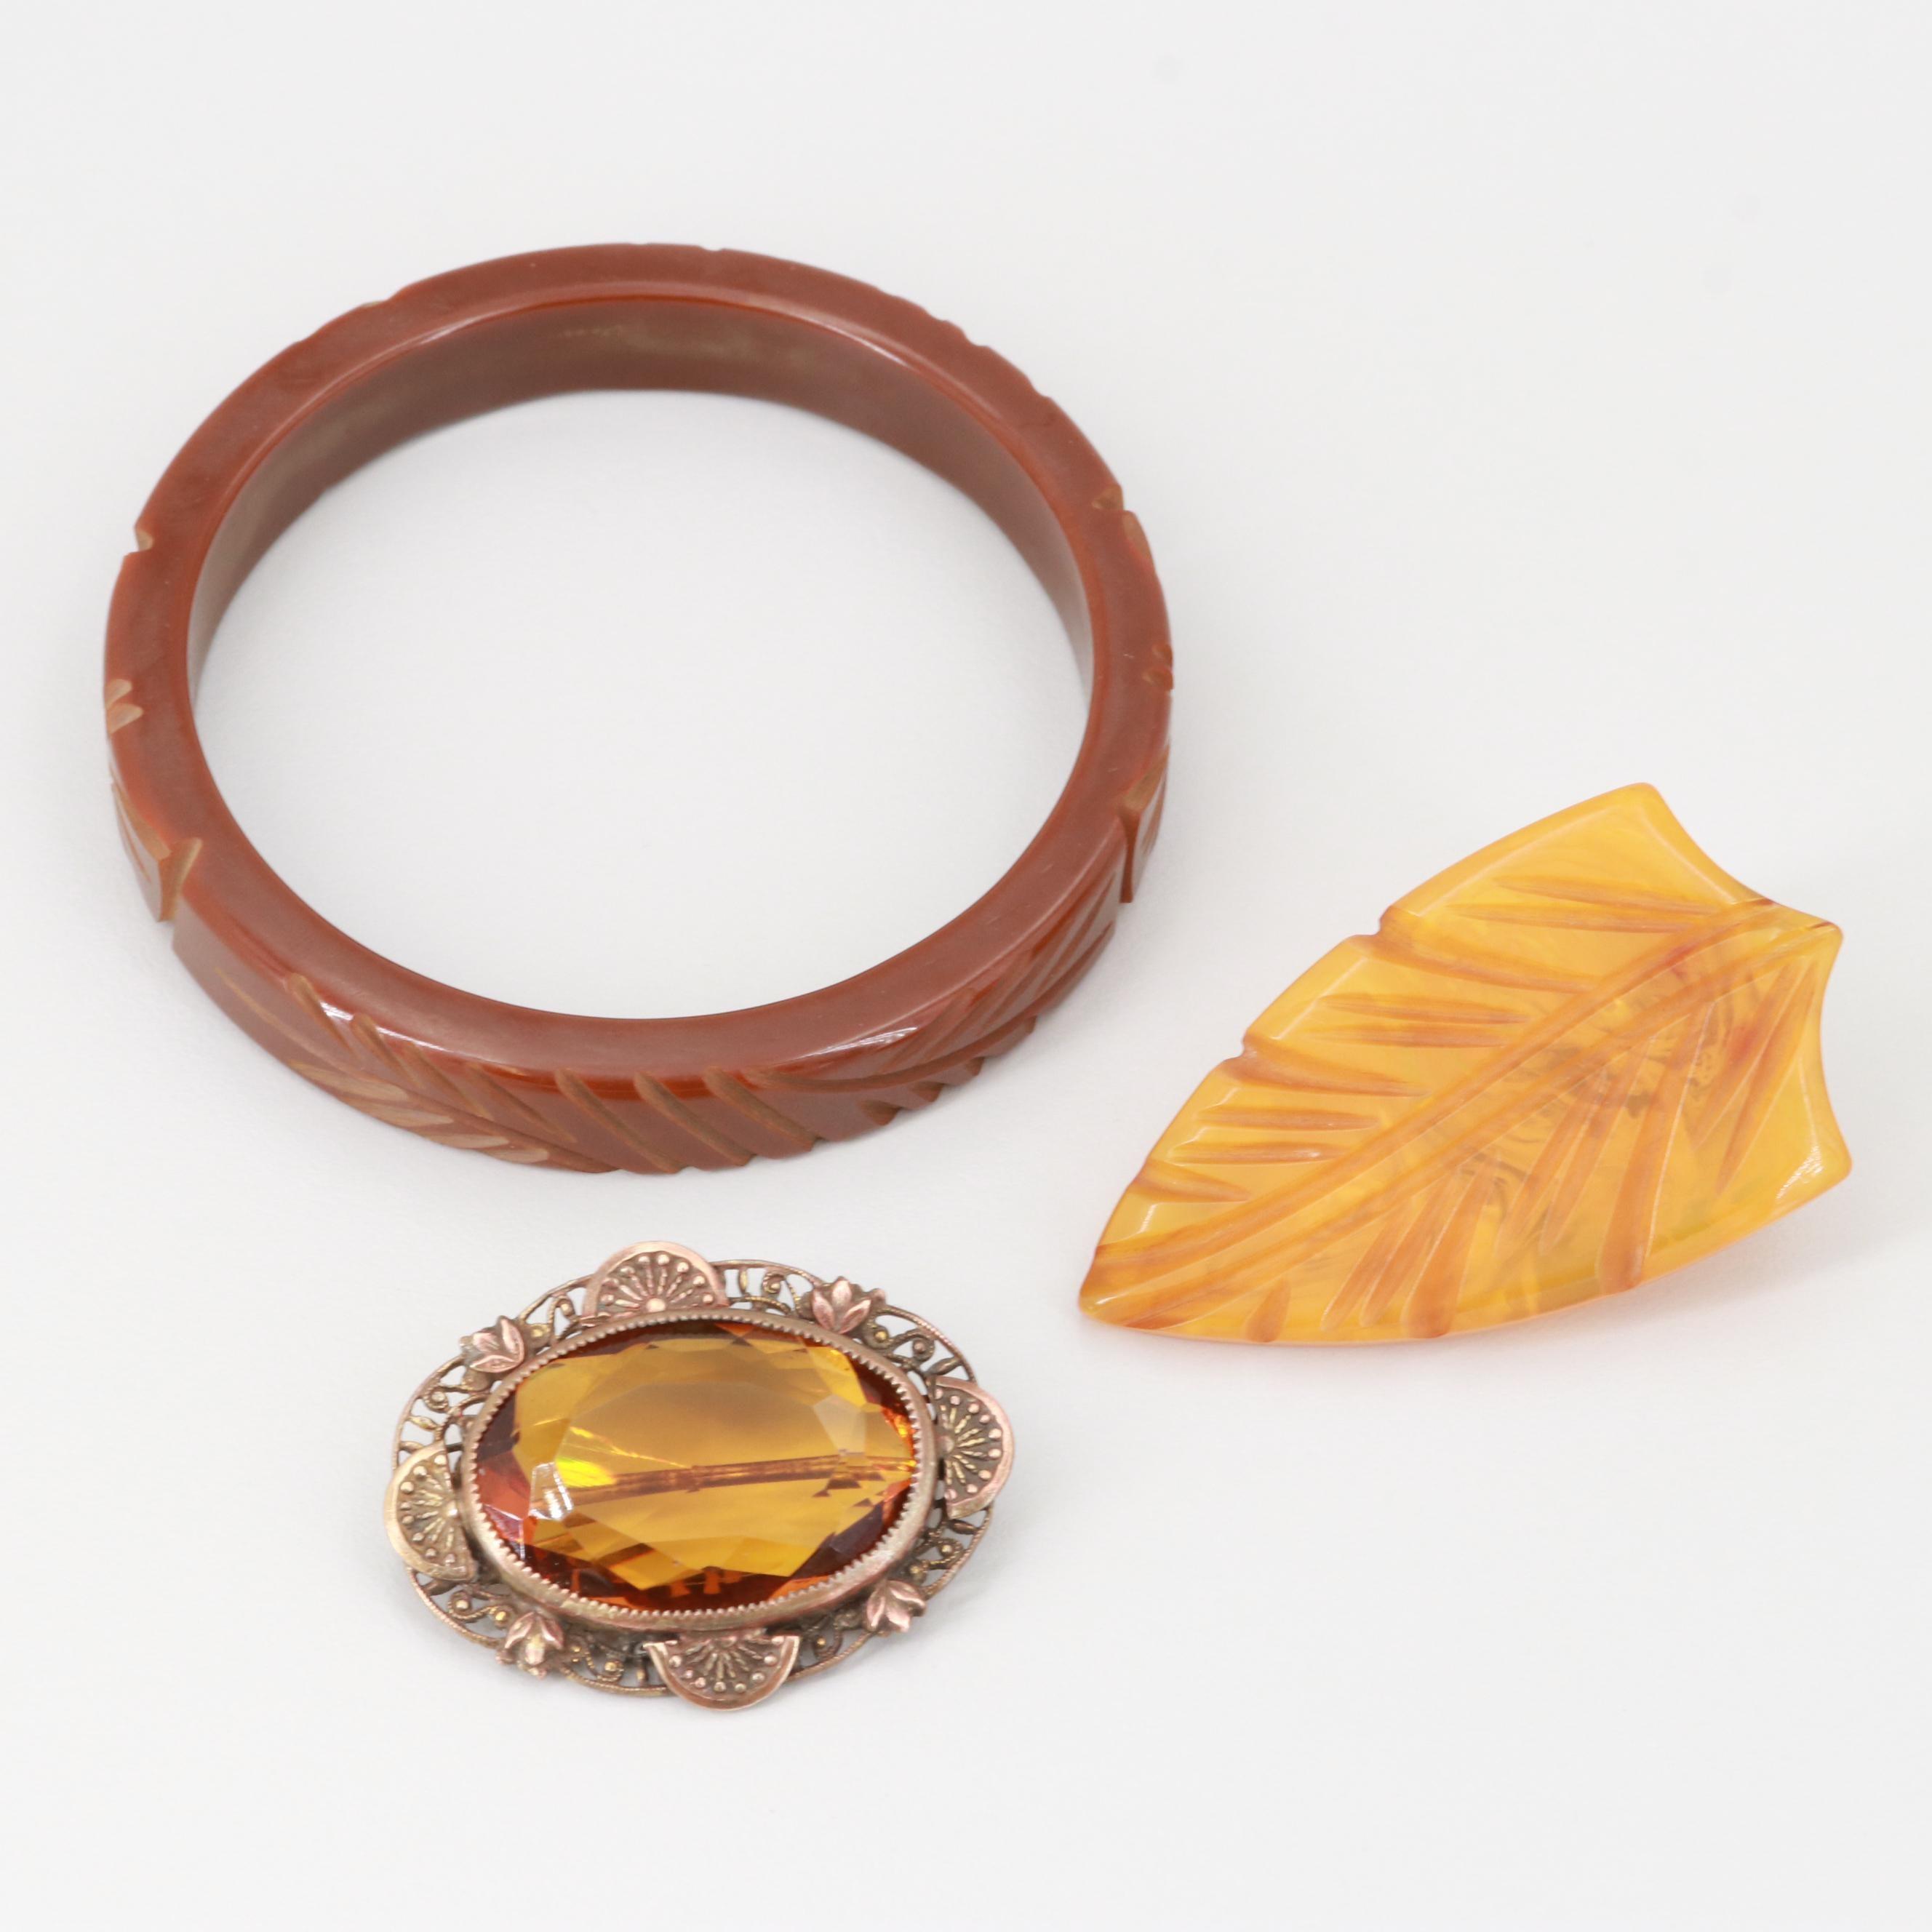 1930s Bakelite and Glass Jewelry Assortment